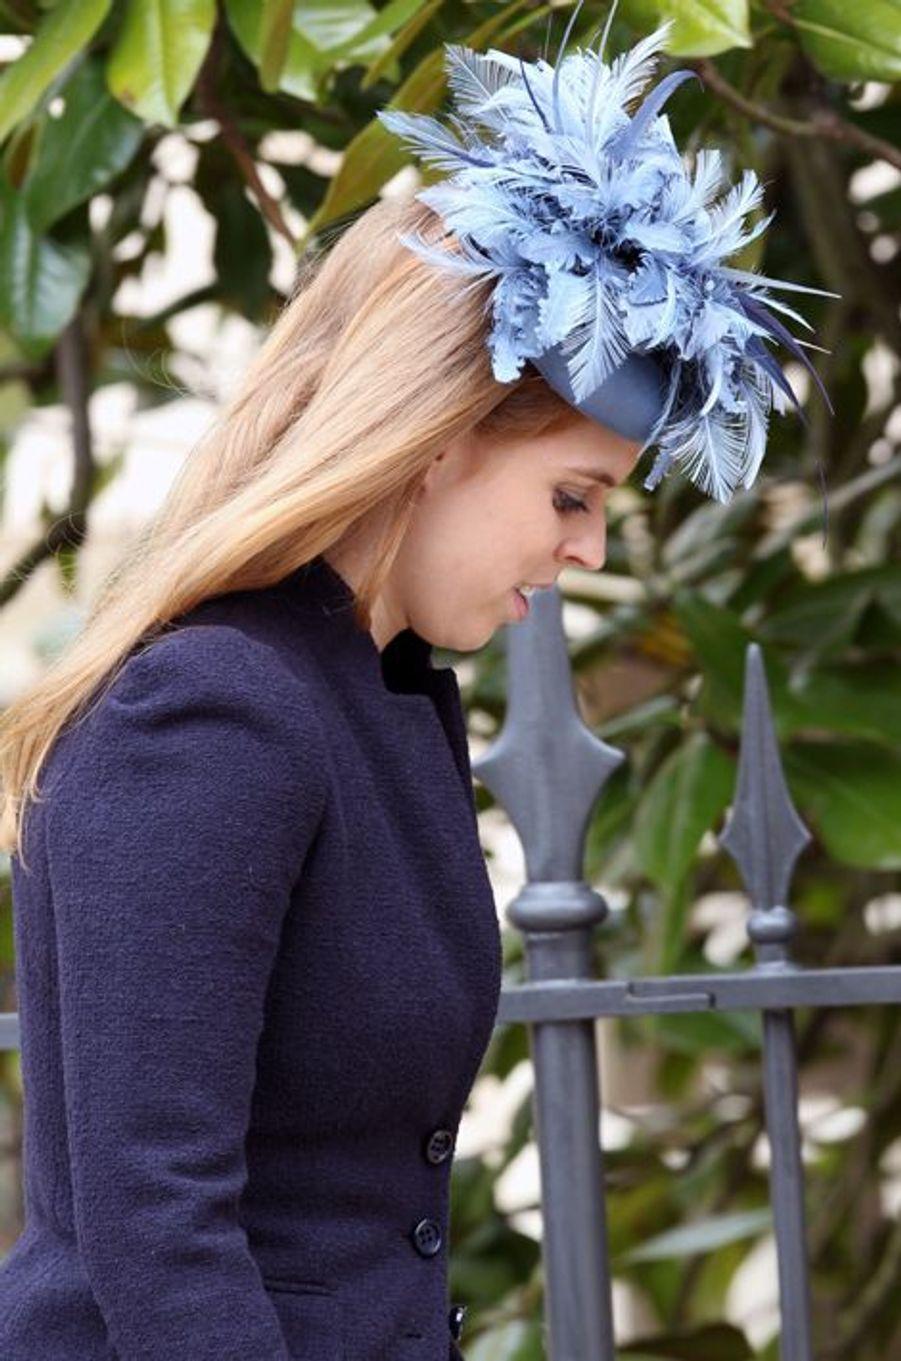 La princesse Beatrice d'York à Windsor, le 5 avril 2015